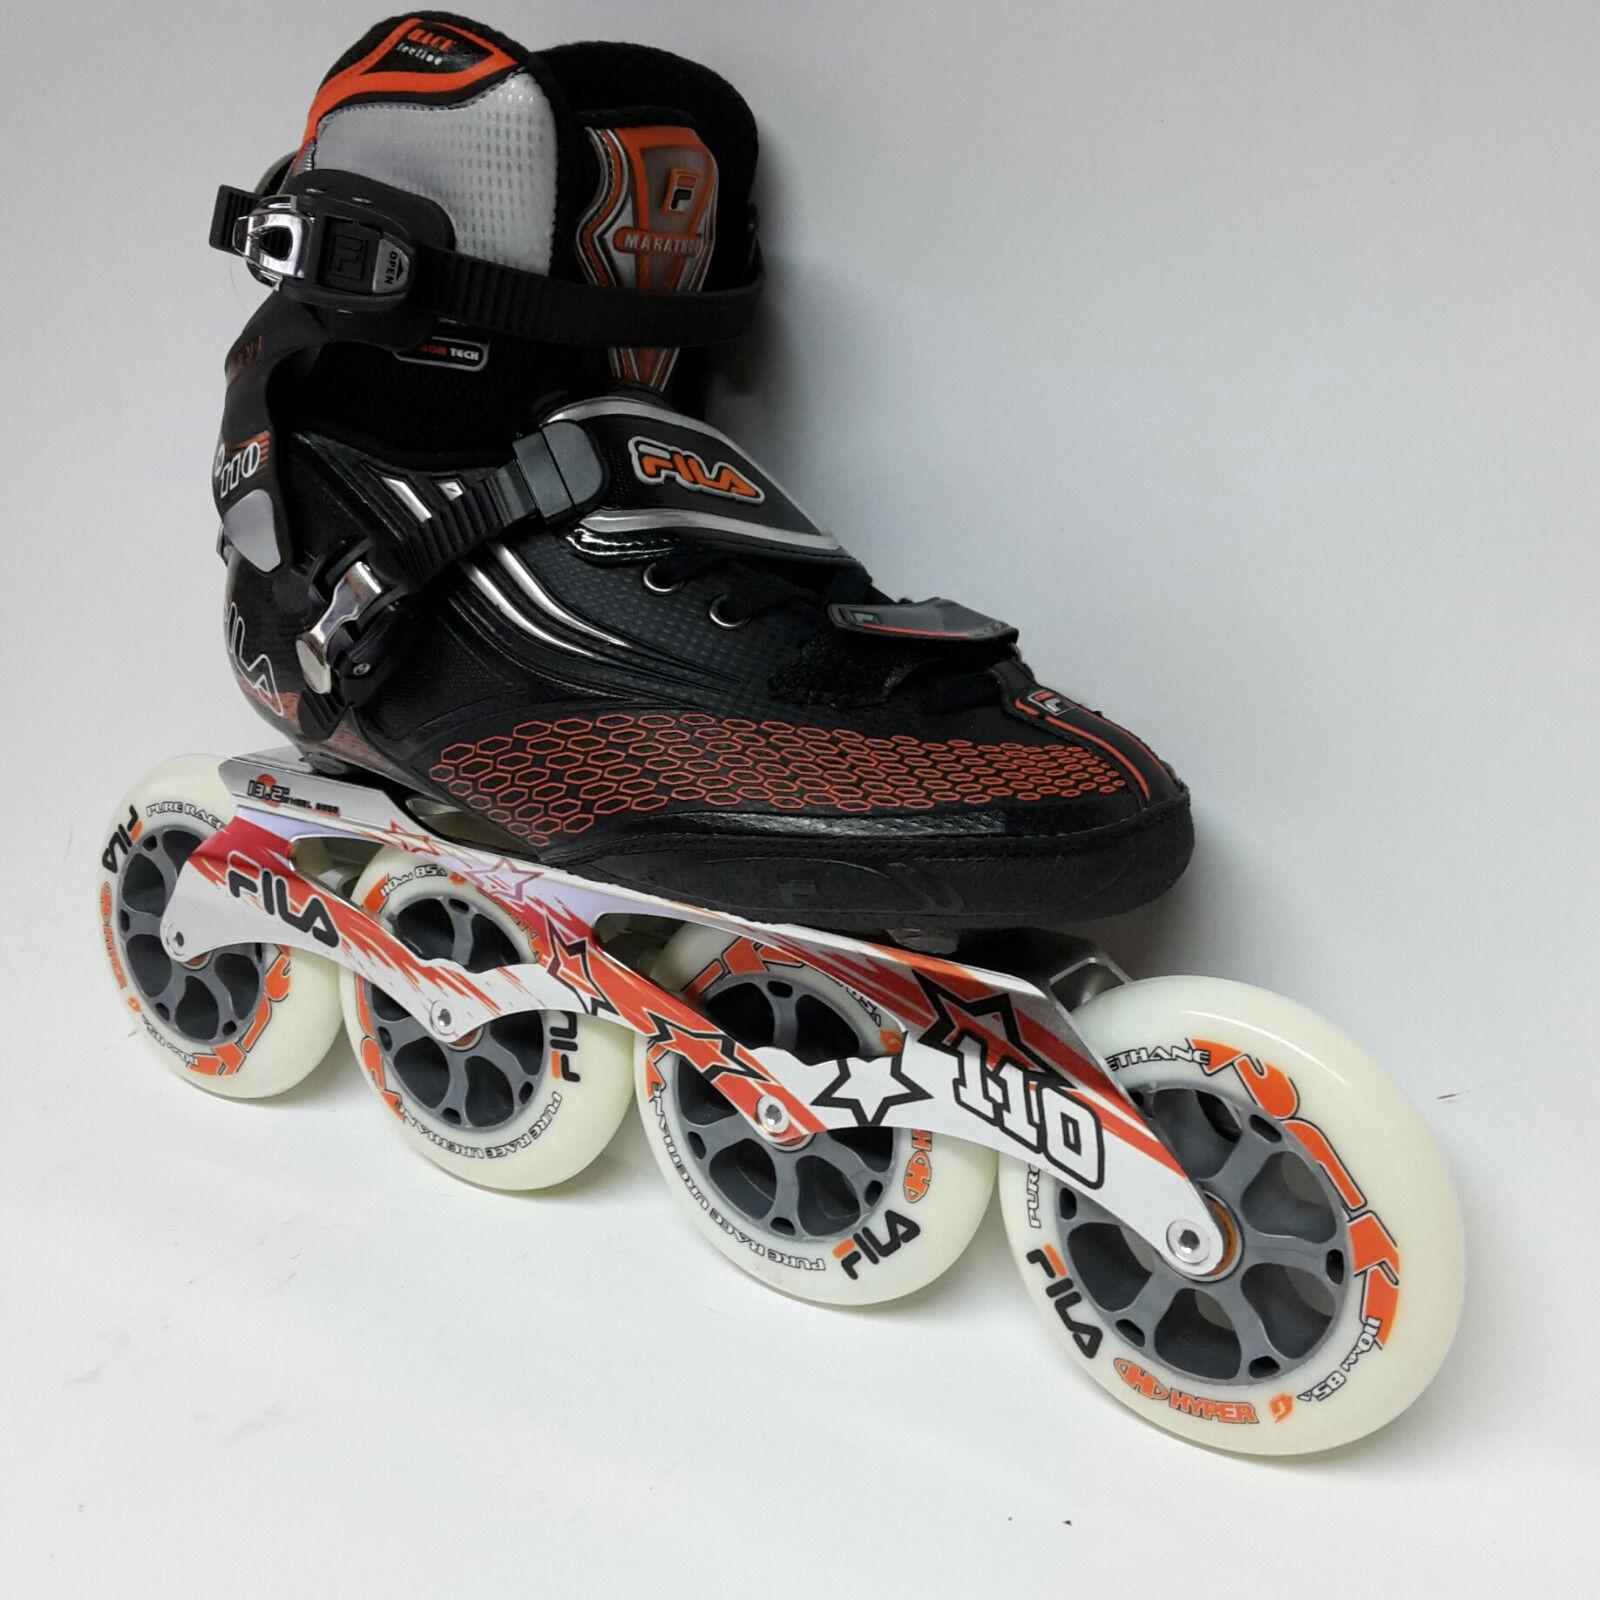 Inlineskating 41 TOP Fila M 110 black Speedskate Marathon Inline Skates 110 mm Rollen Gr